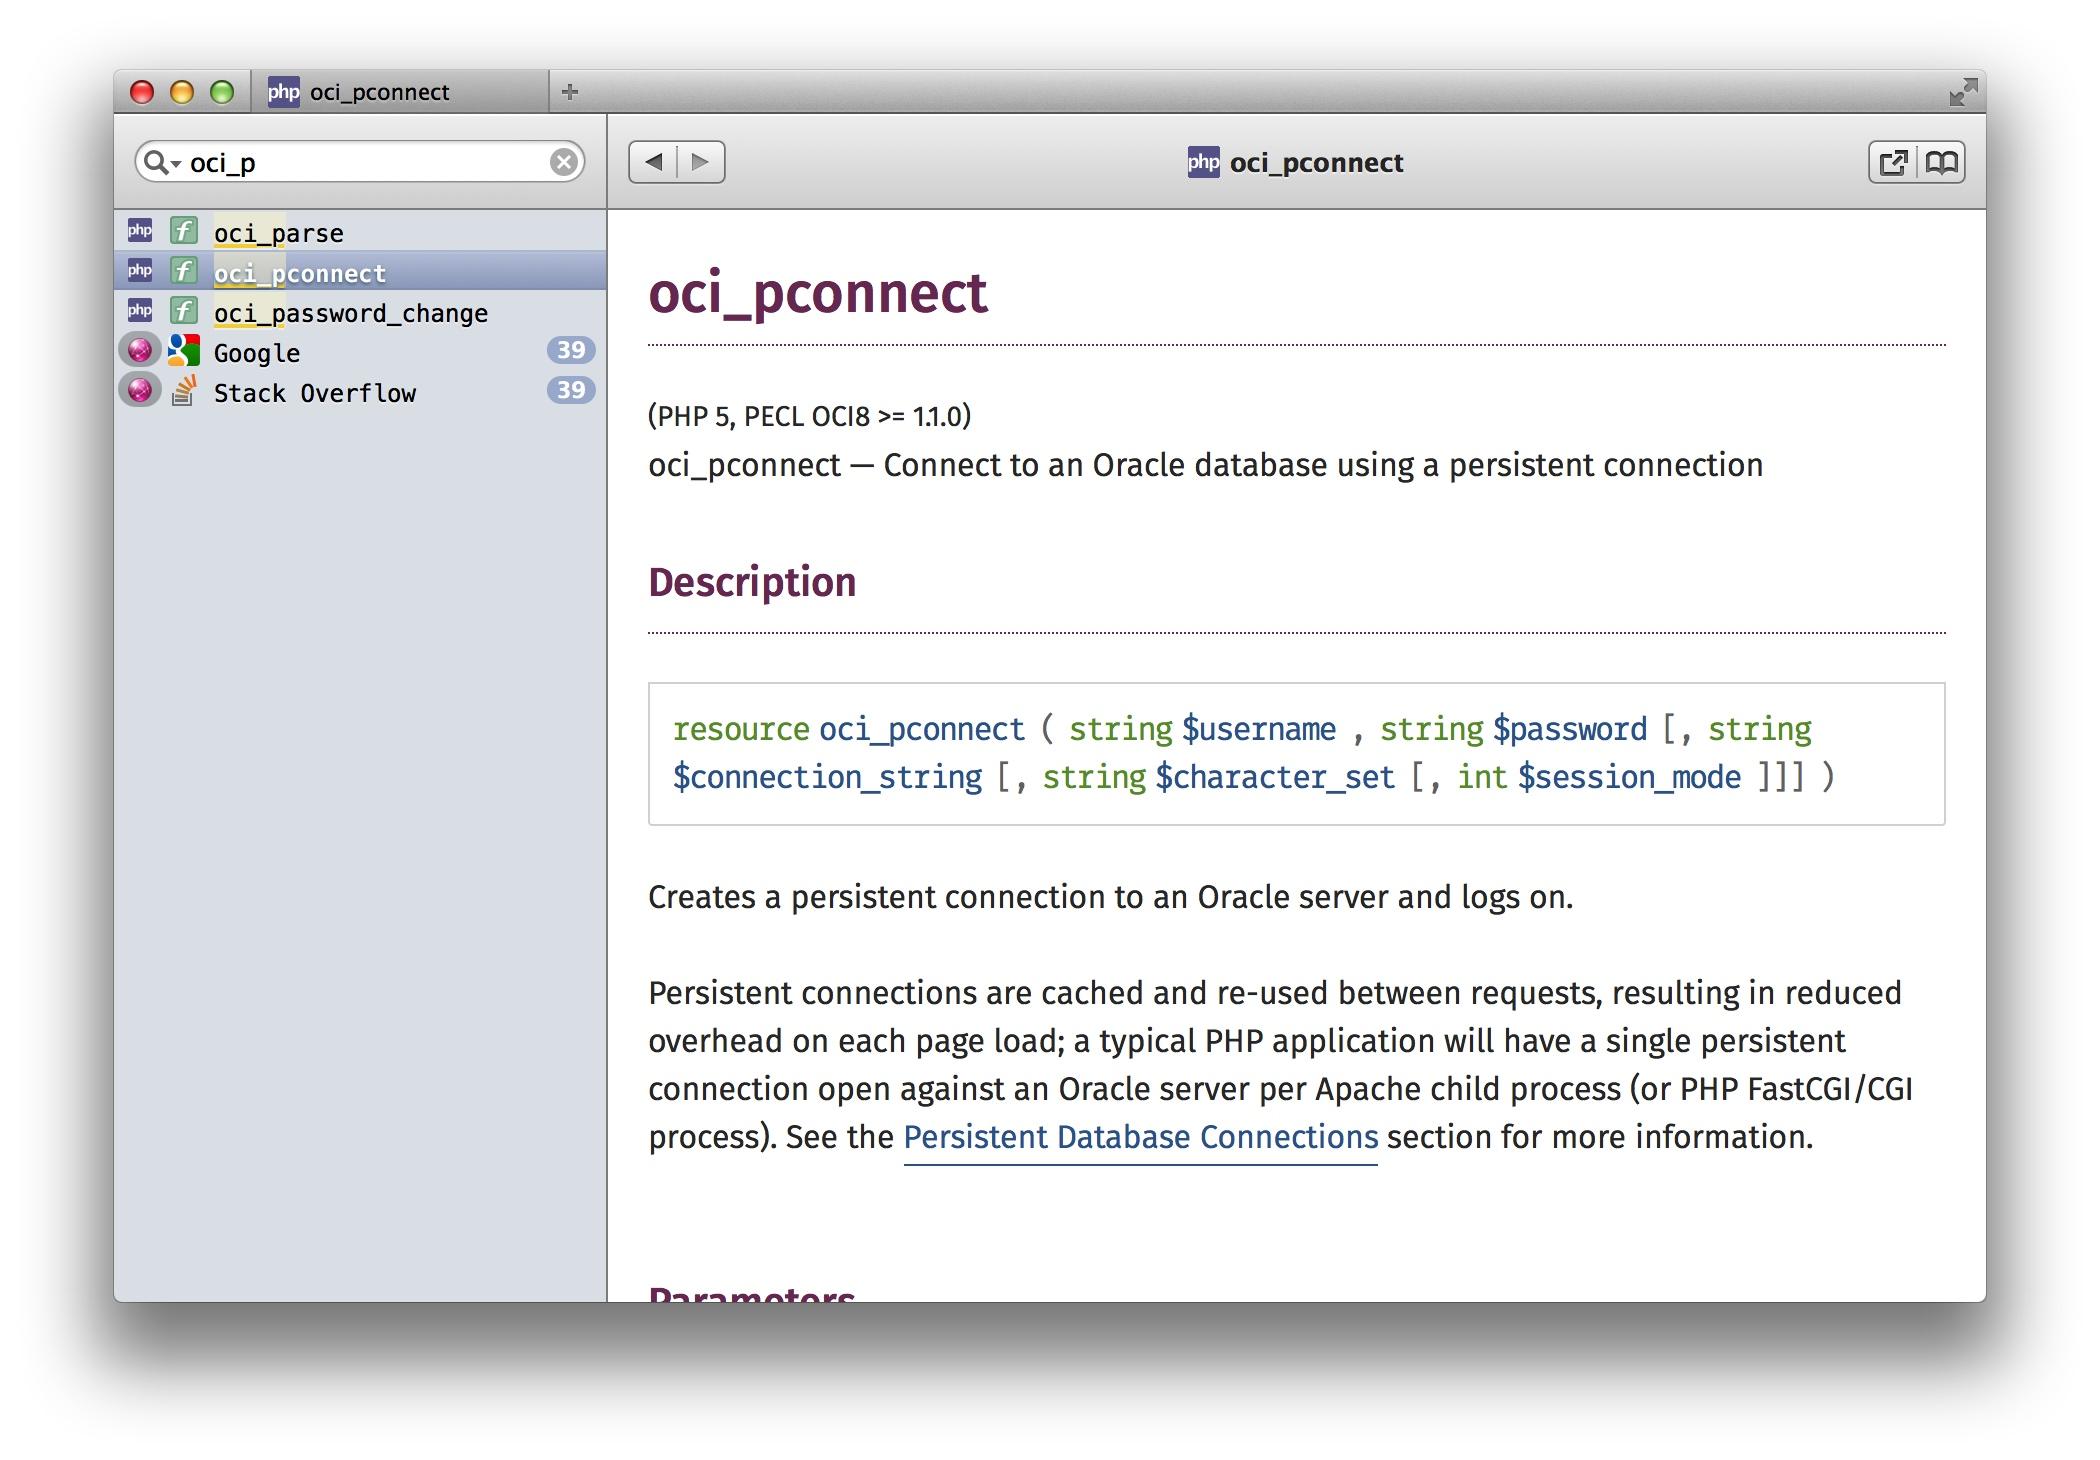 oci_pconnect